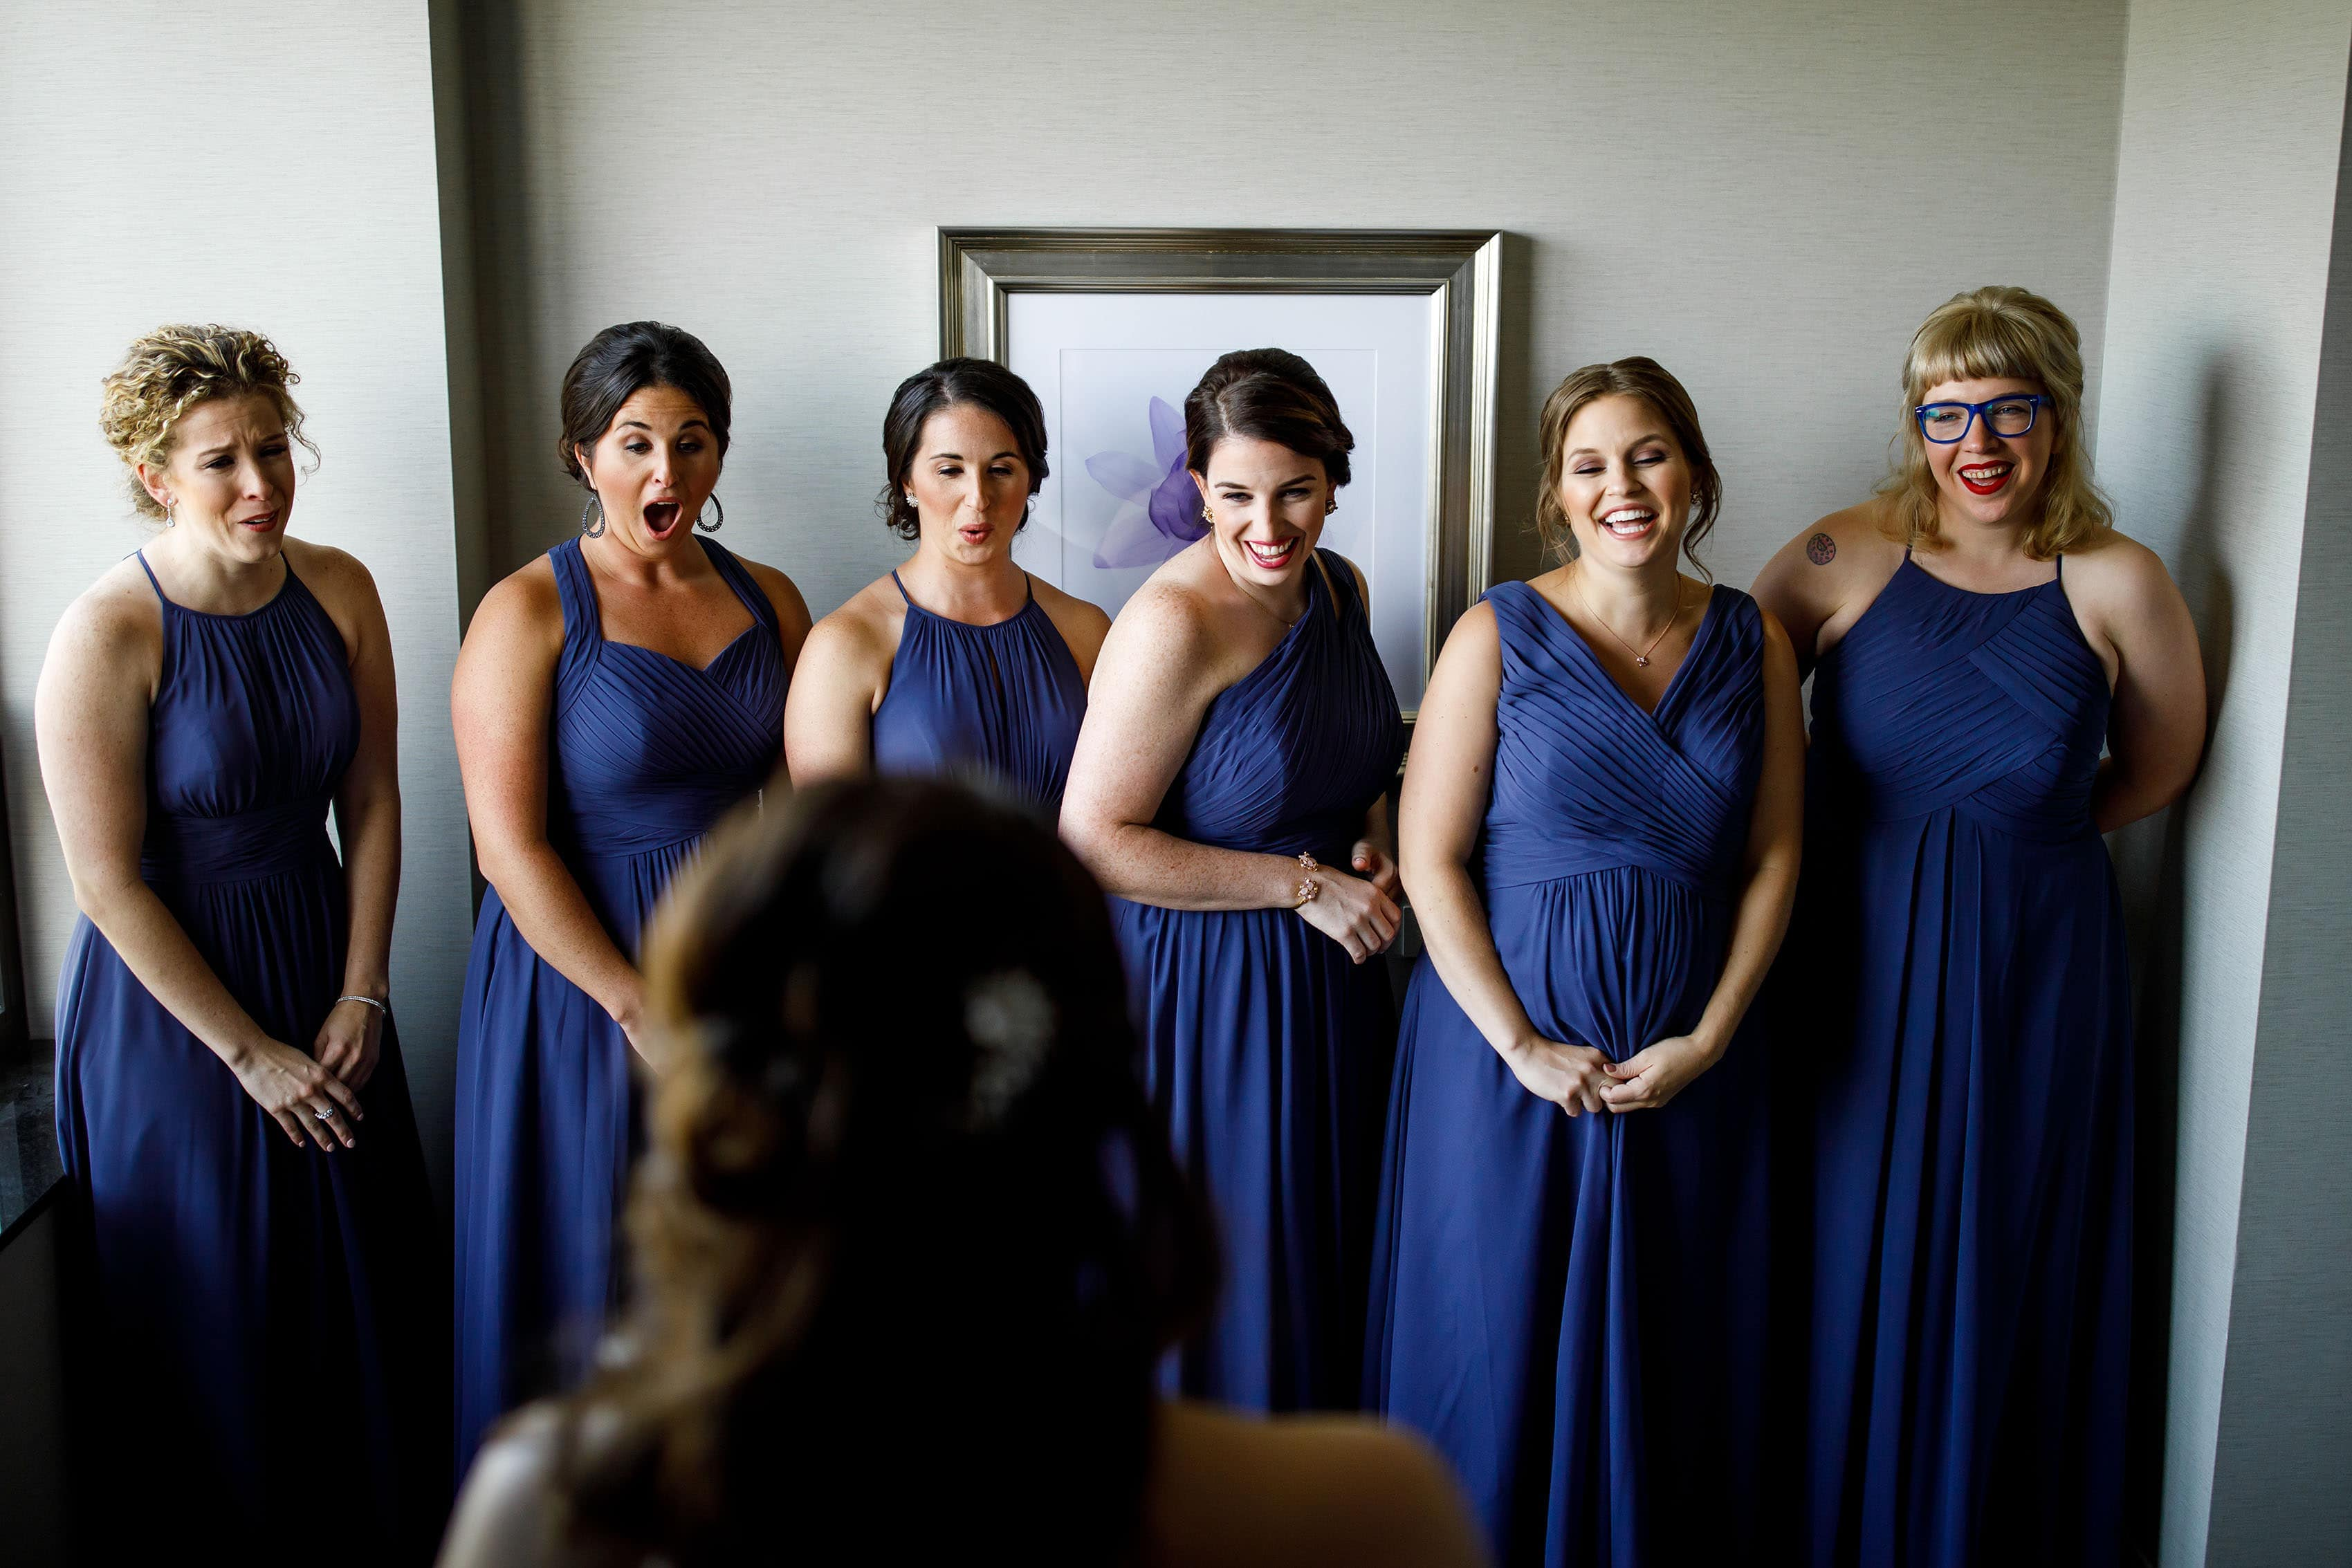 Bridesmaids react to seeing the bride at La Banque hotel